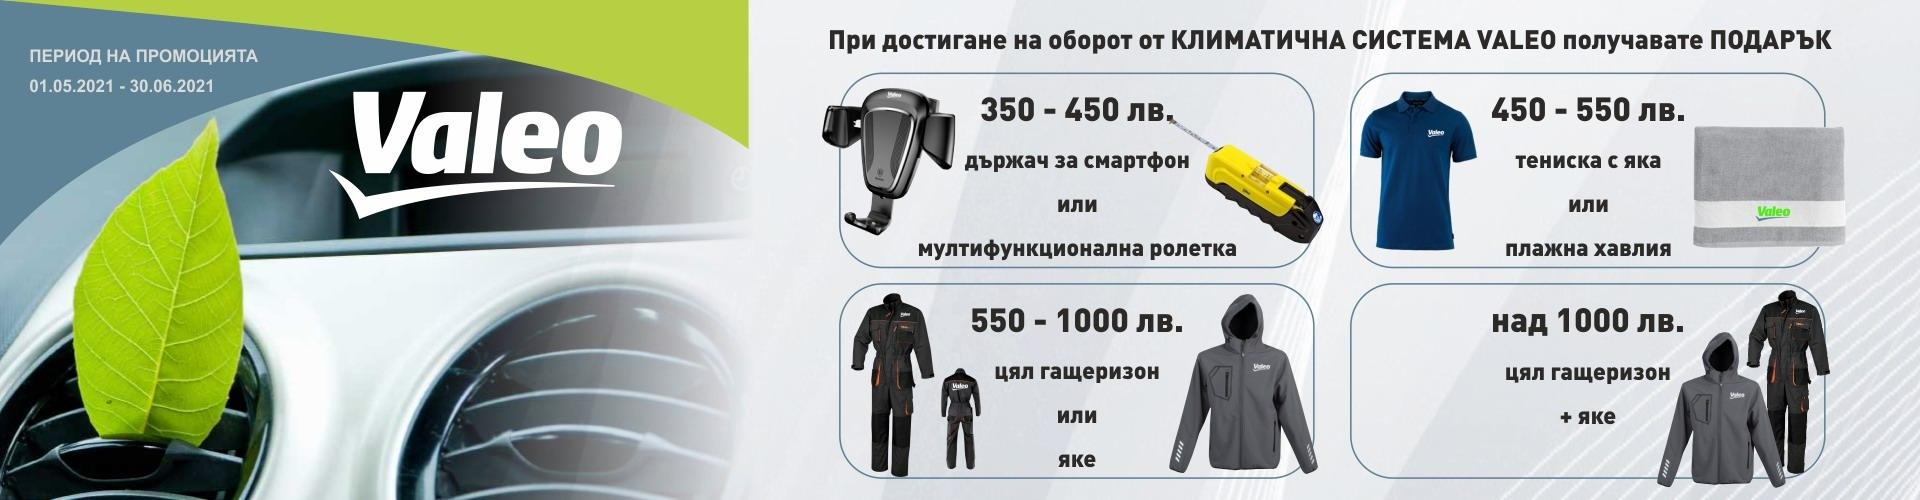 promo_valeo_klimatichna_sistema_01.05.2021-30.06.2021_banner_.jpg